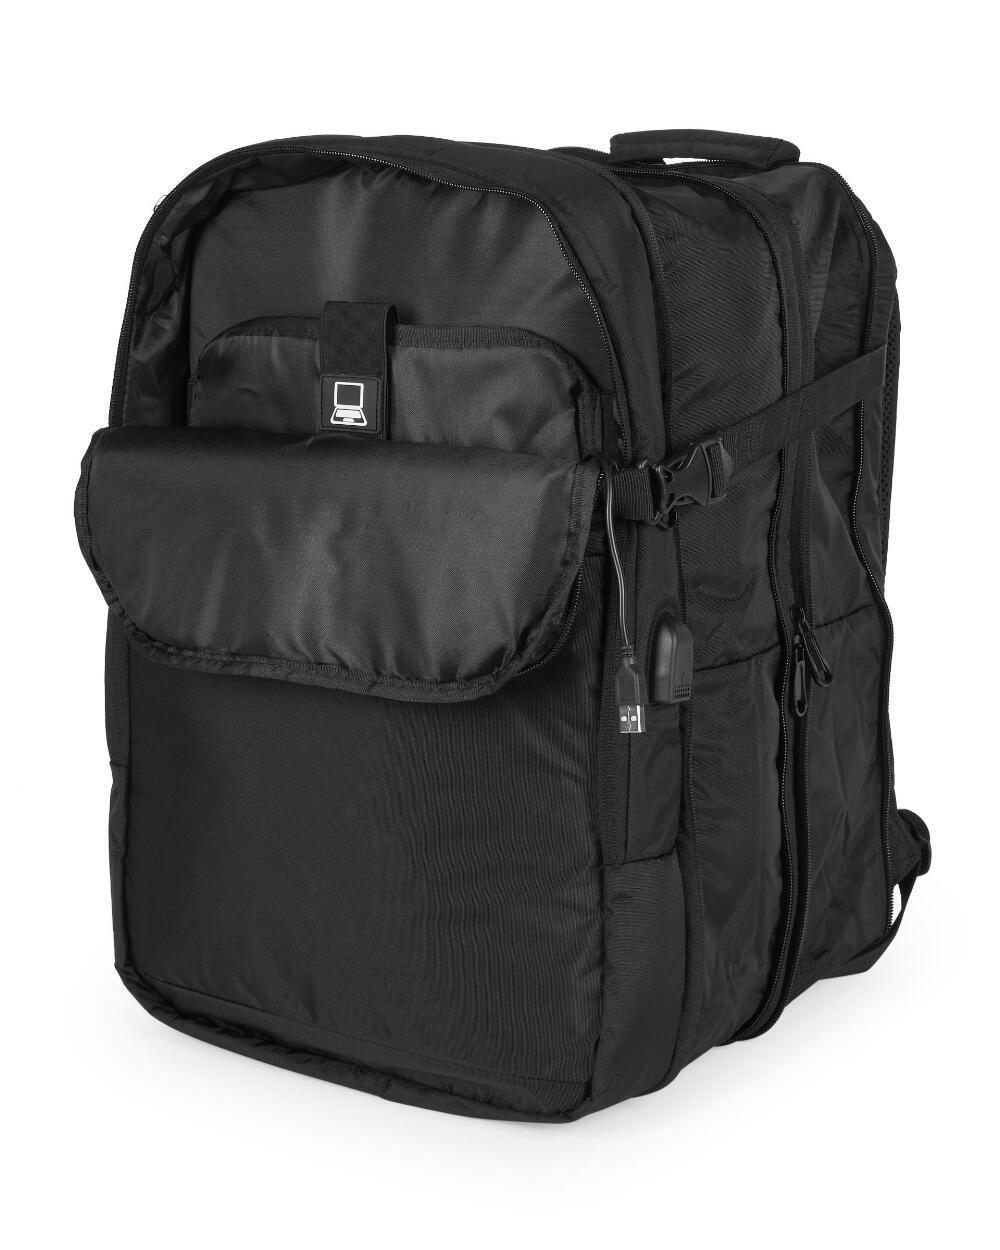 Duchamp London Expandable Travel Backpack Suitcase Luggage T